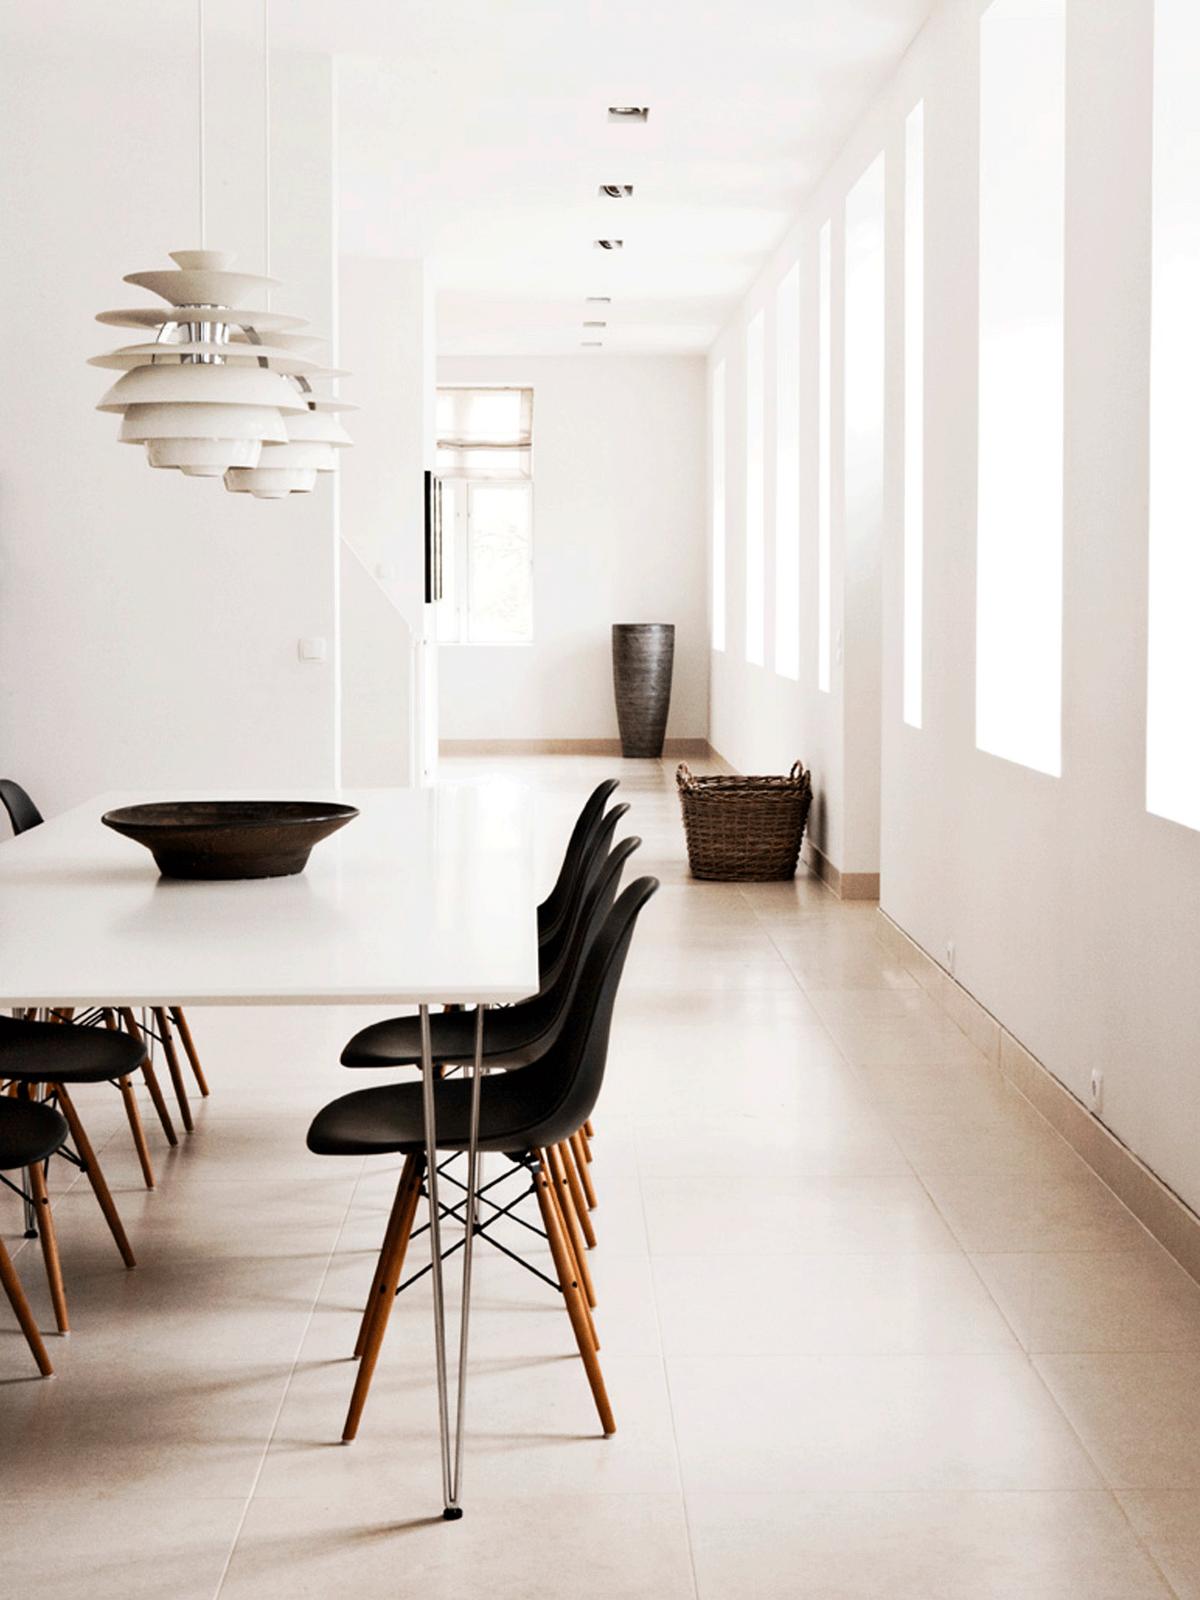 Sillas Eames | COMEDOR | Pinterest | Sillas eames, Eames y Sillas